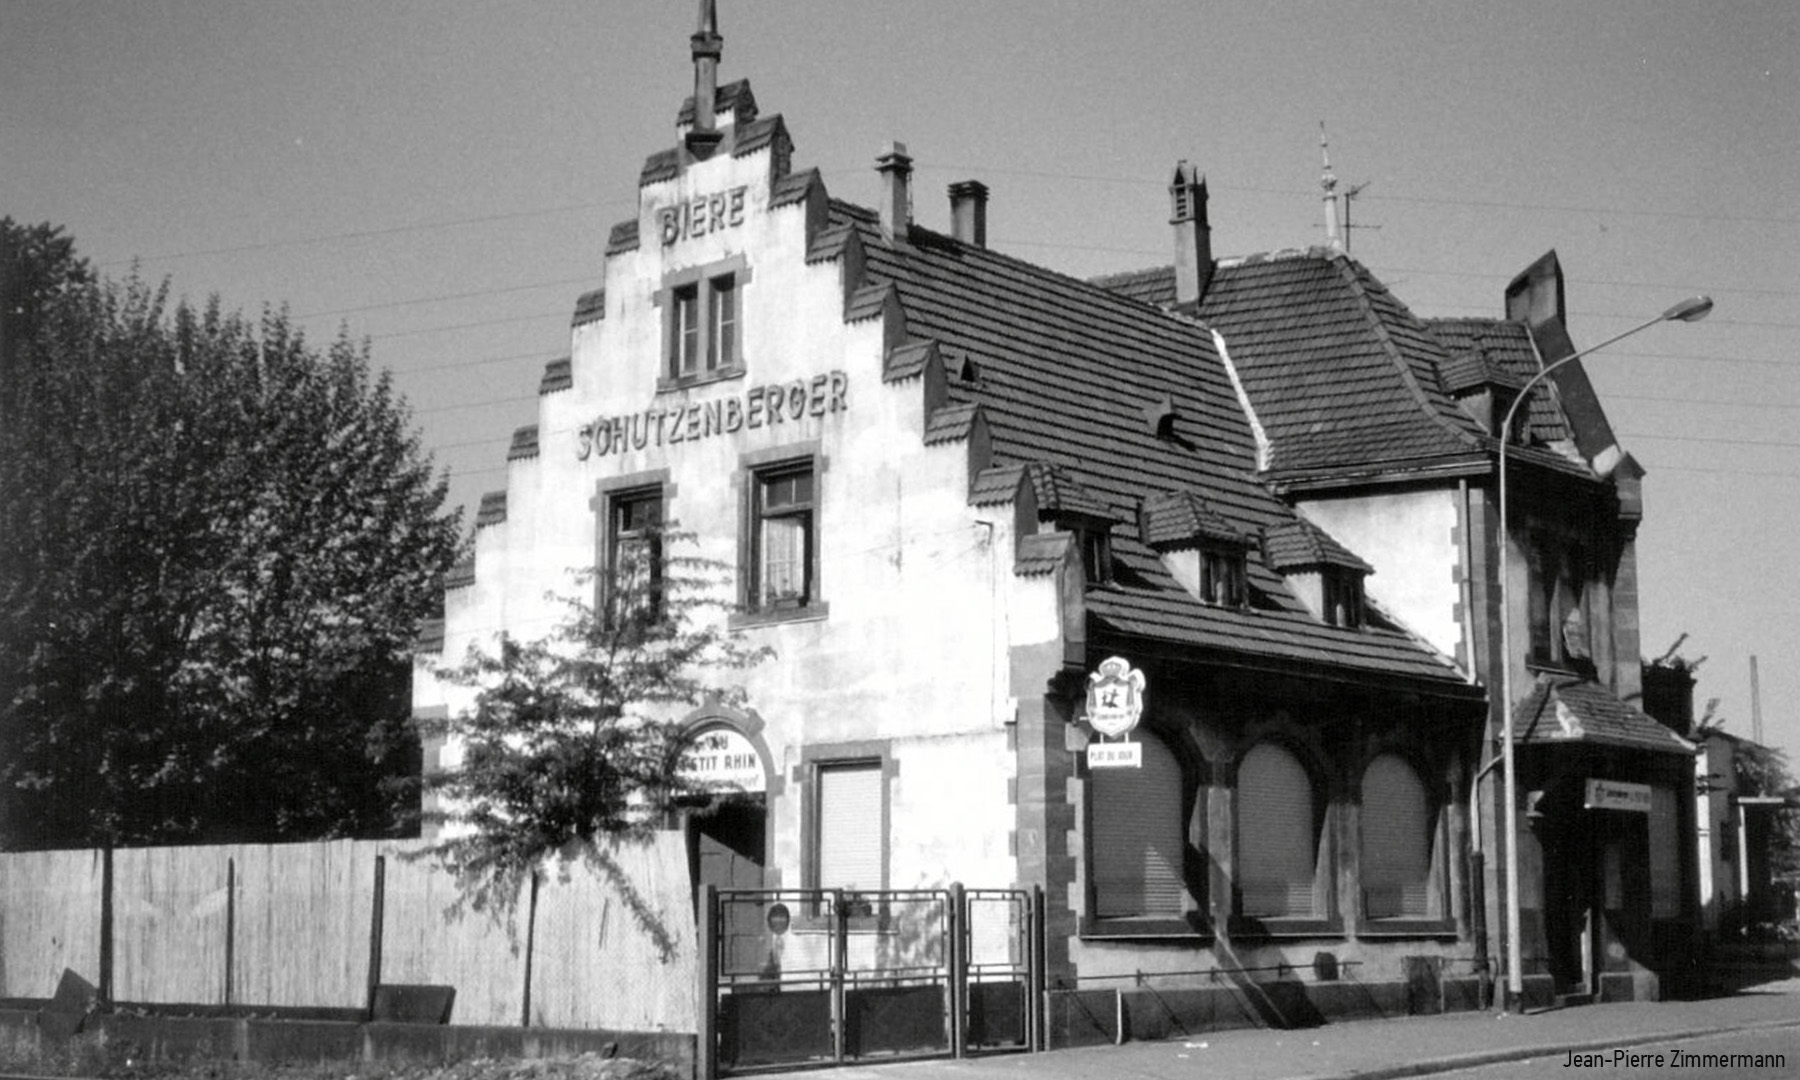 Restaurant Schutzenberger Au Petit Rhin au Port du Rhin Strasbourg - Urbex Alsace